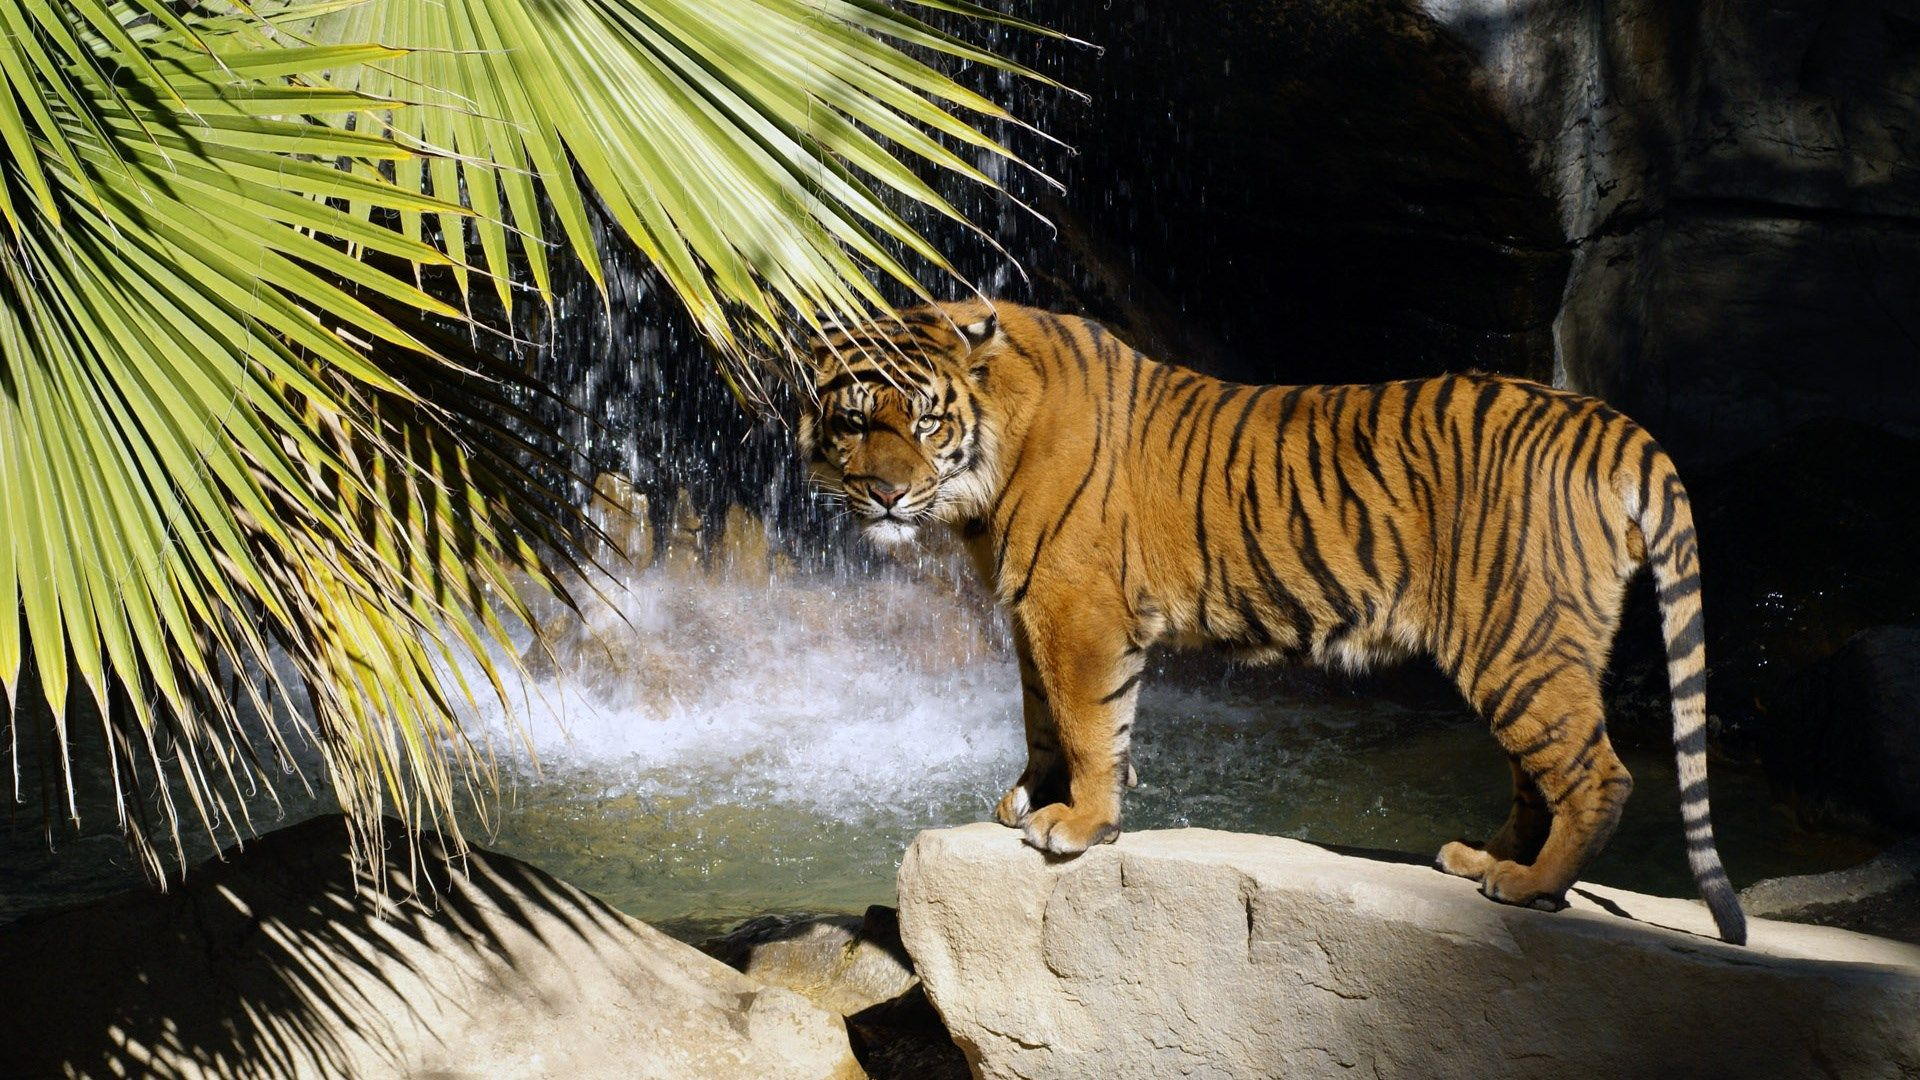 HD Widescreen Wallpapers tiger wallpaper, 1920x1080 (583